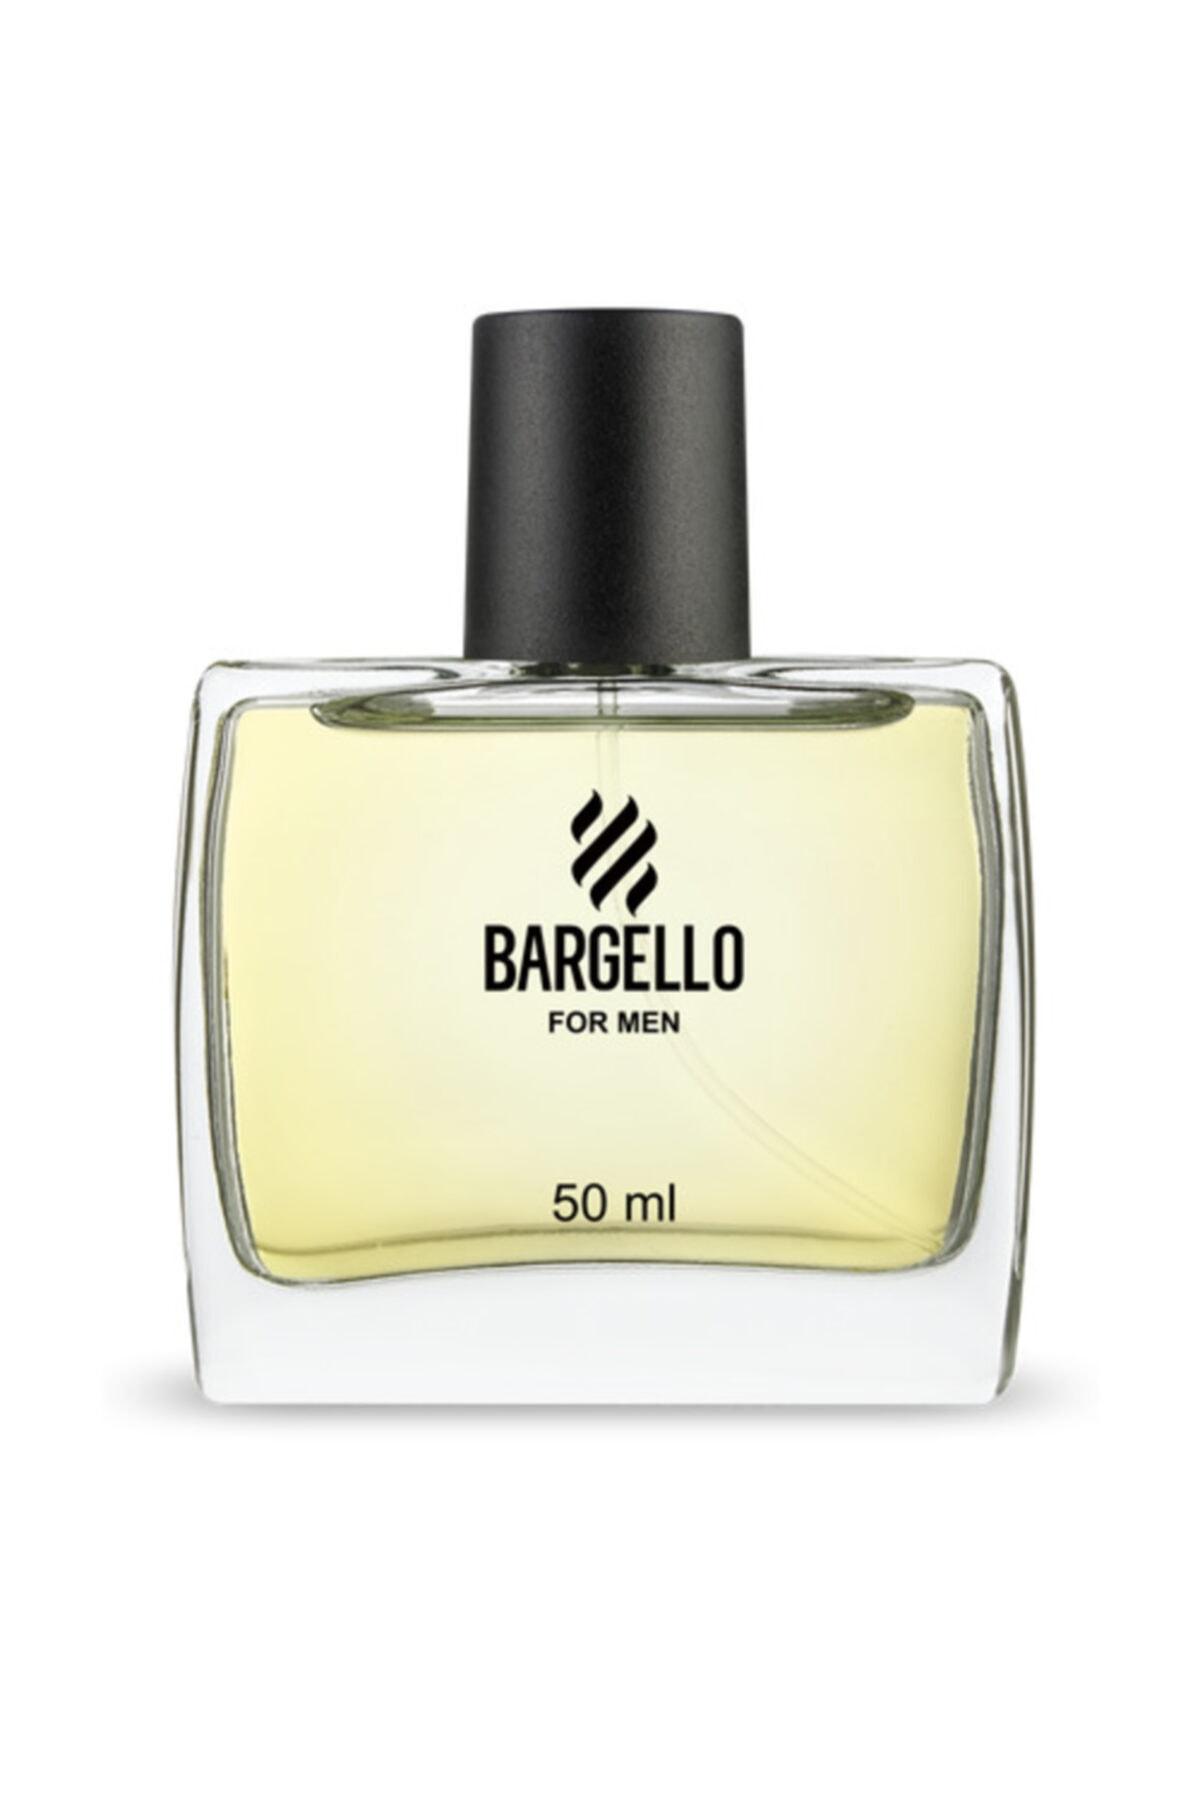 Bargello Erkek Parfüm 517 Woody 50 Ml Edp 1